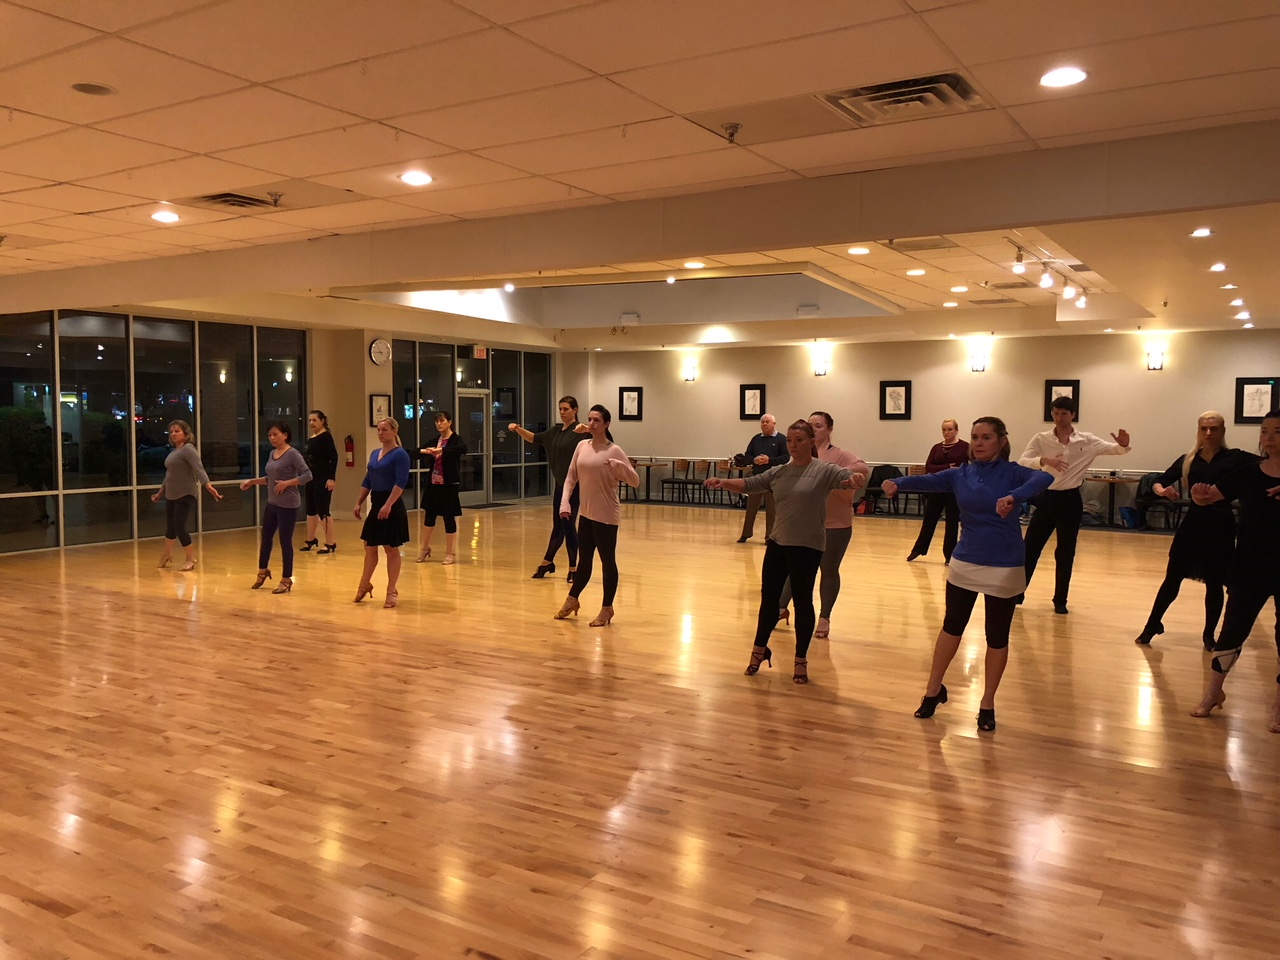 Ultimate Ballroom Dance Studio workshop